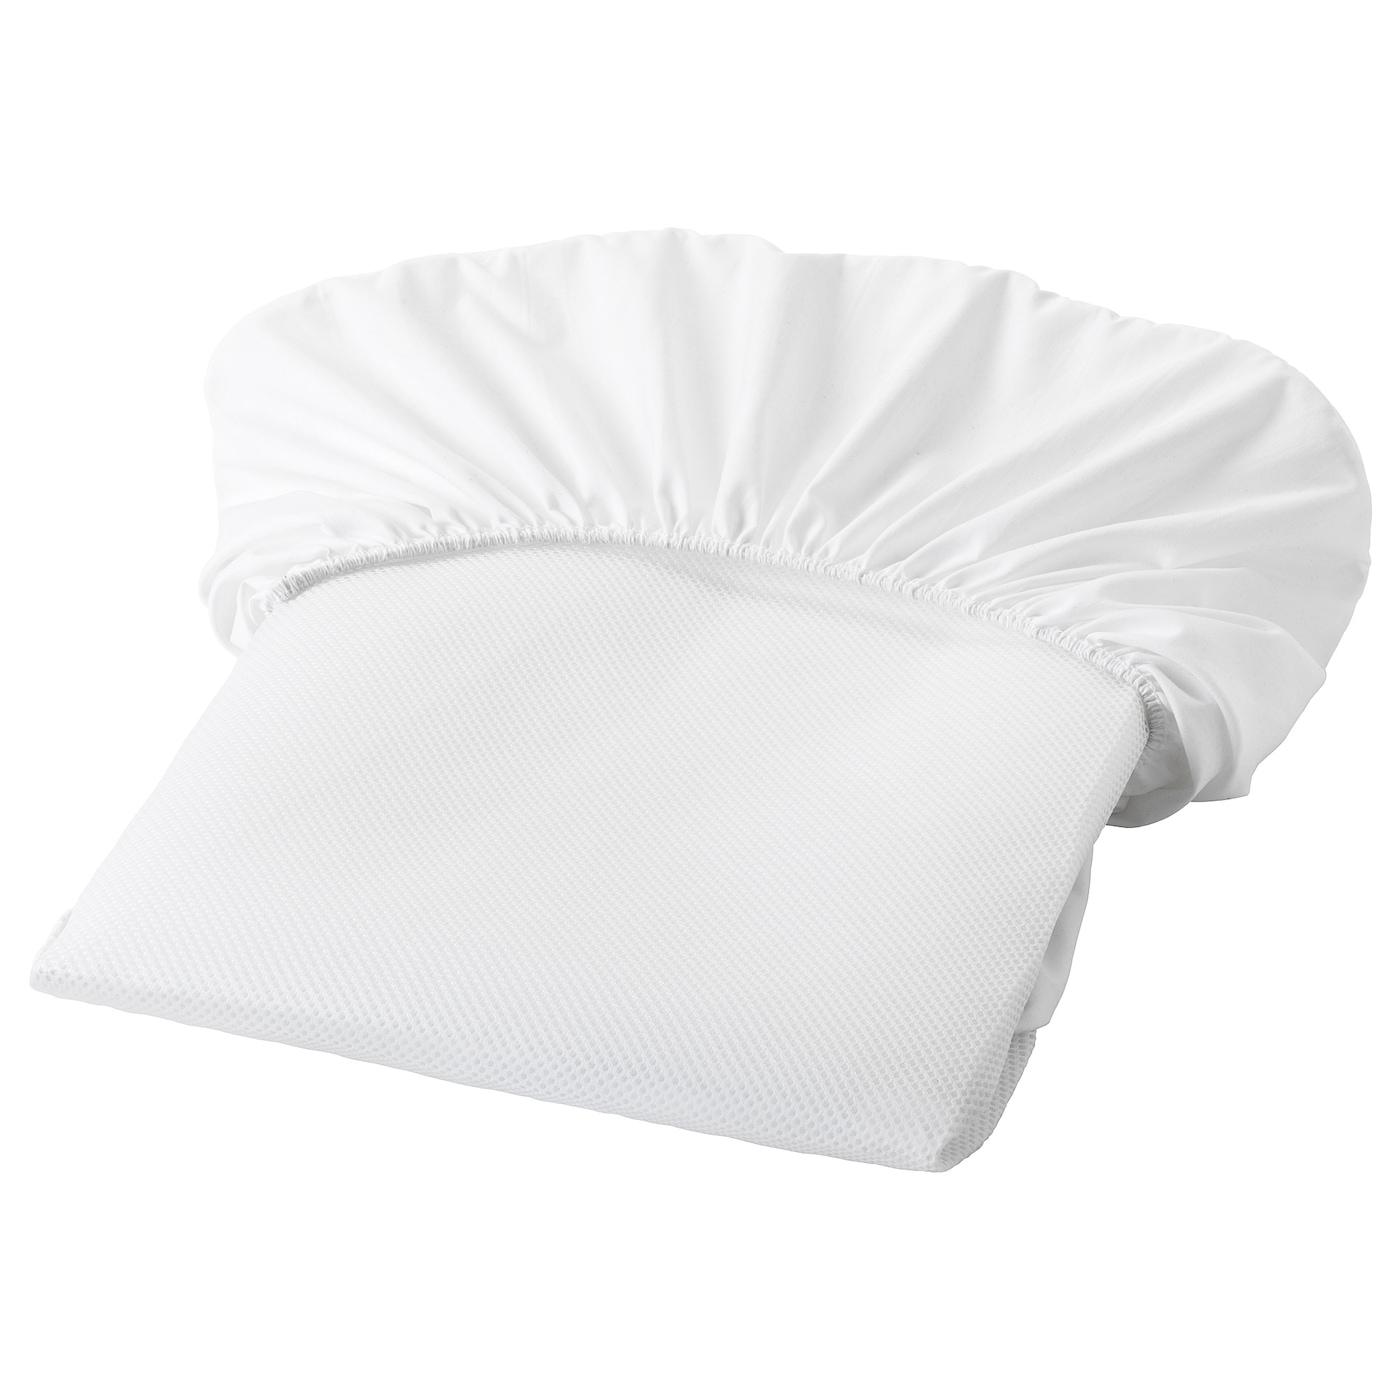 Ikea LENAST Mattress protector, white, 27 1/2x52